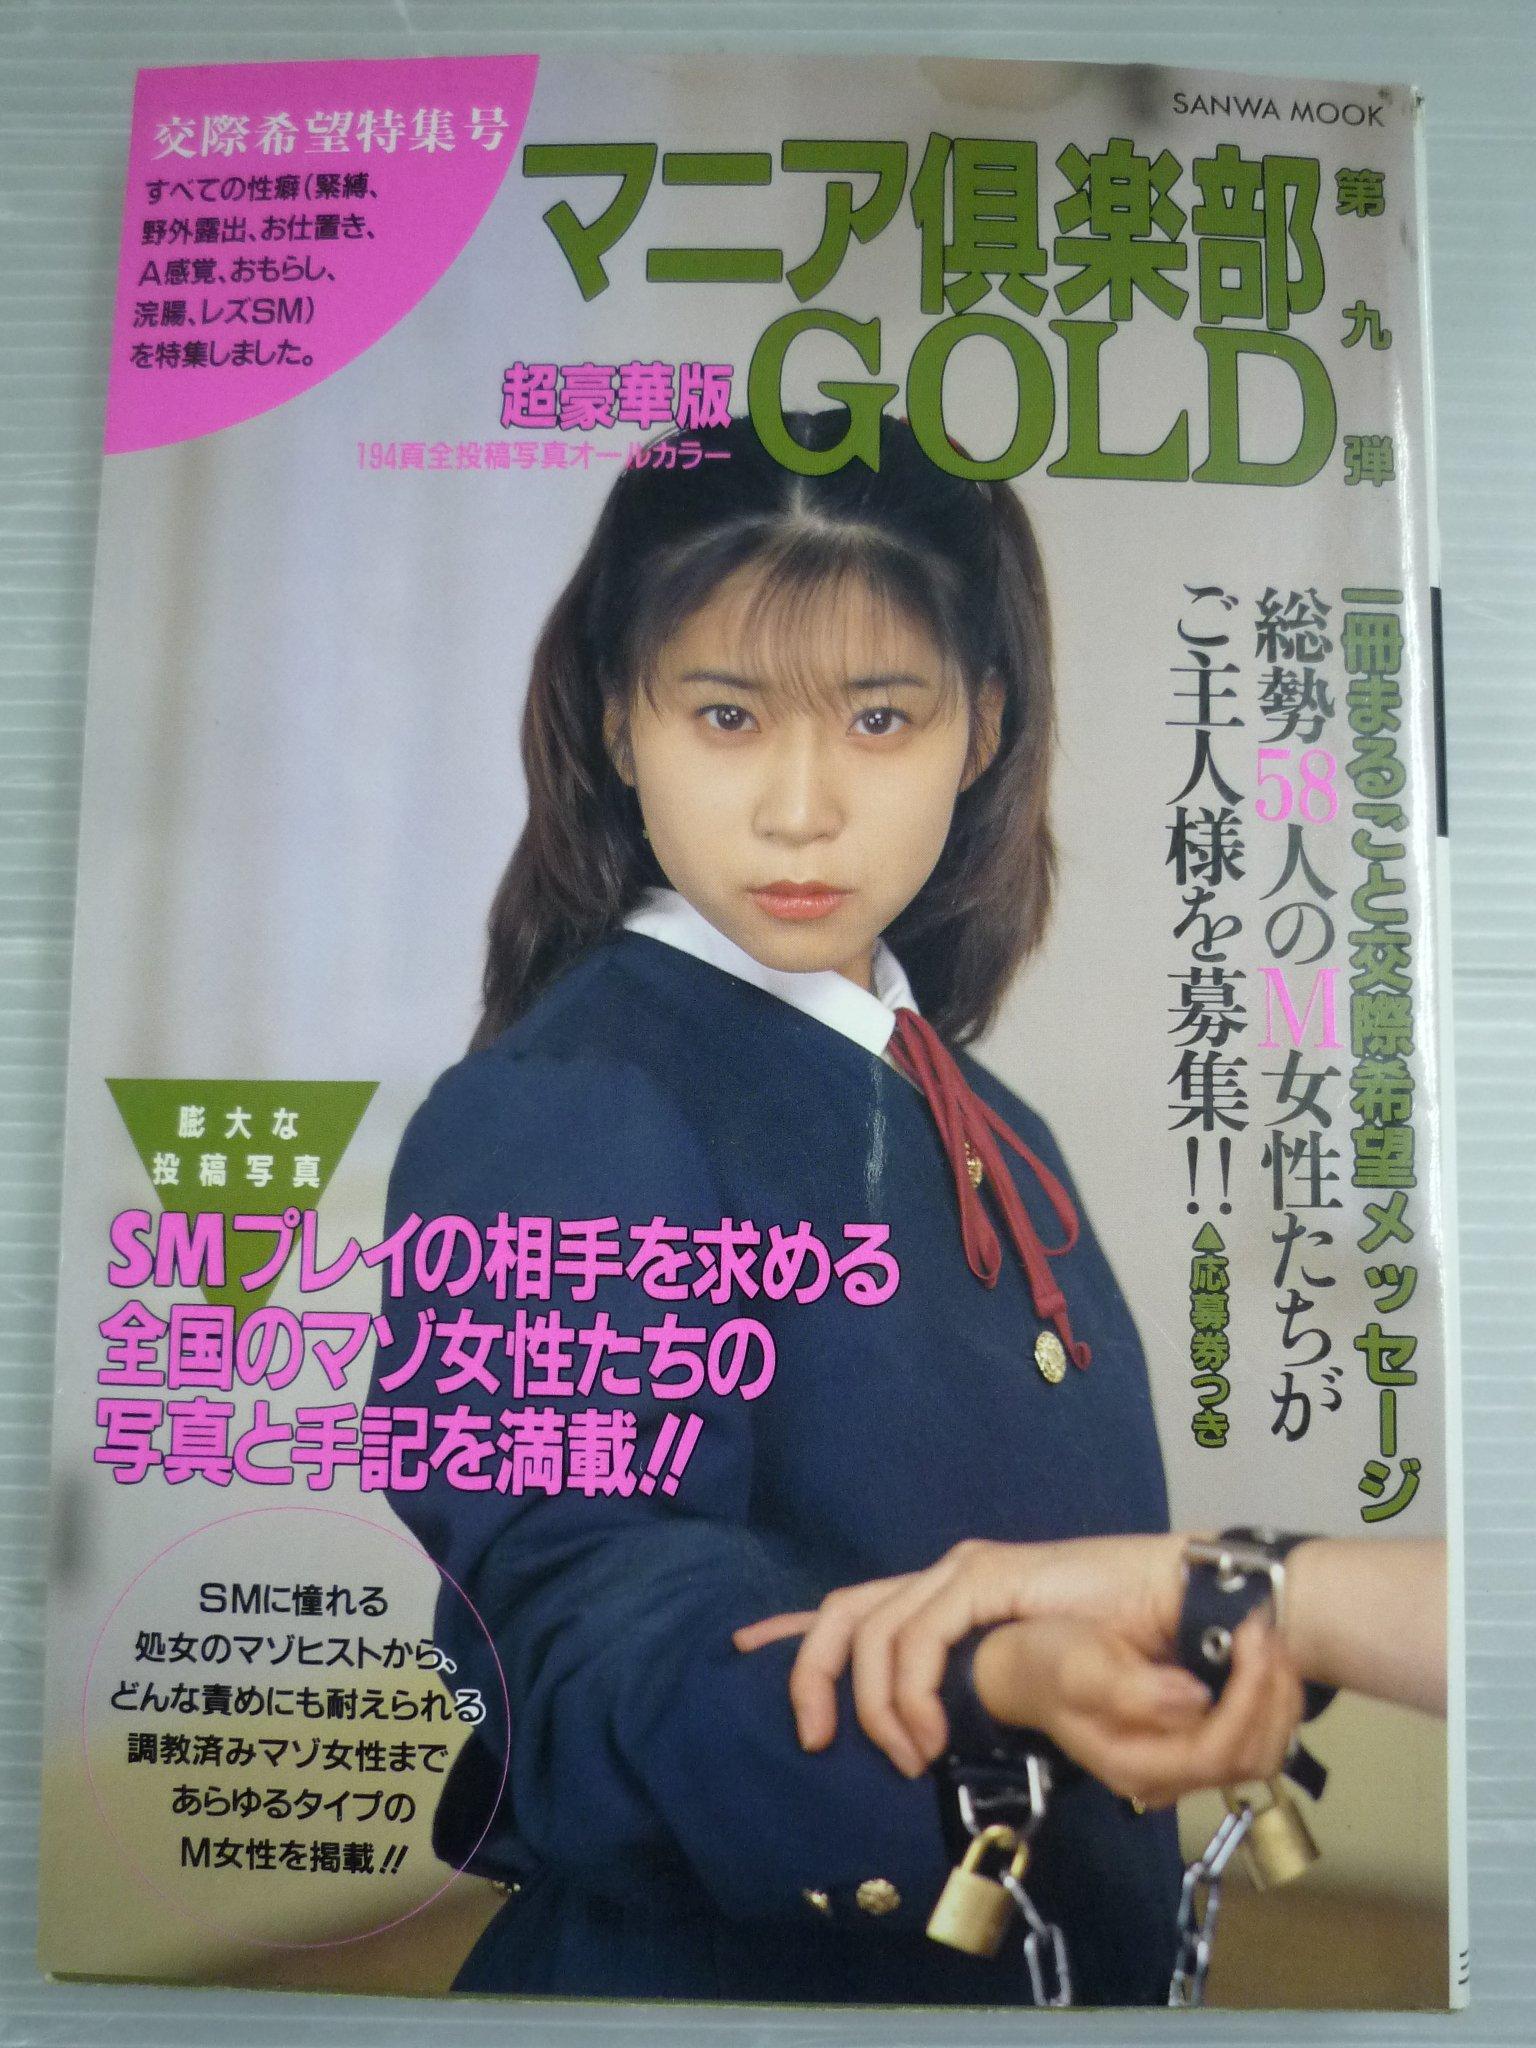 SANWA MOOK マニア倶楽部GOLD 第...